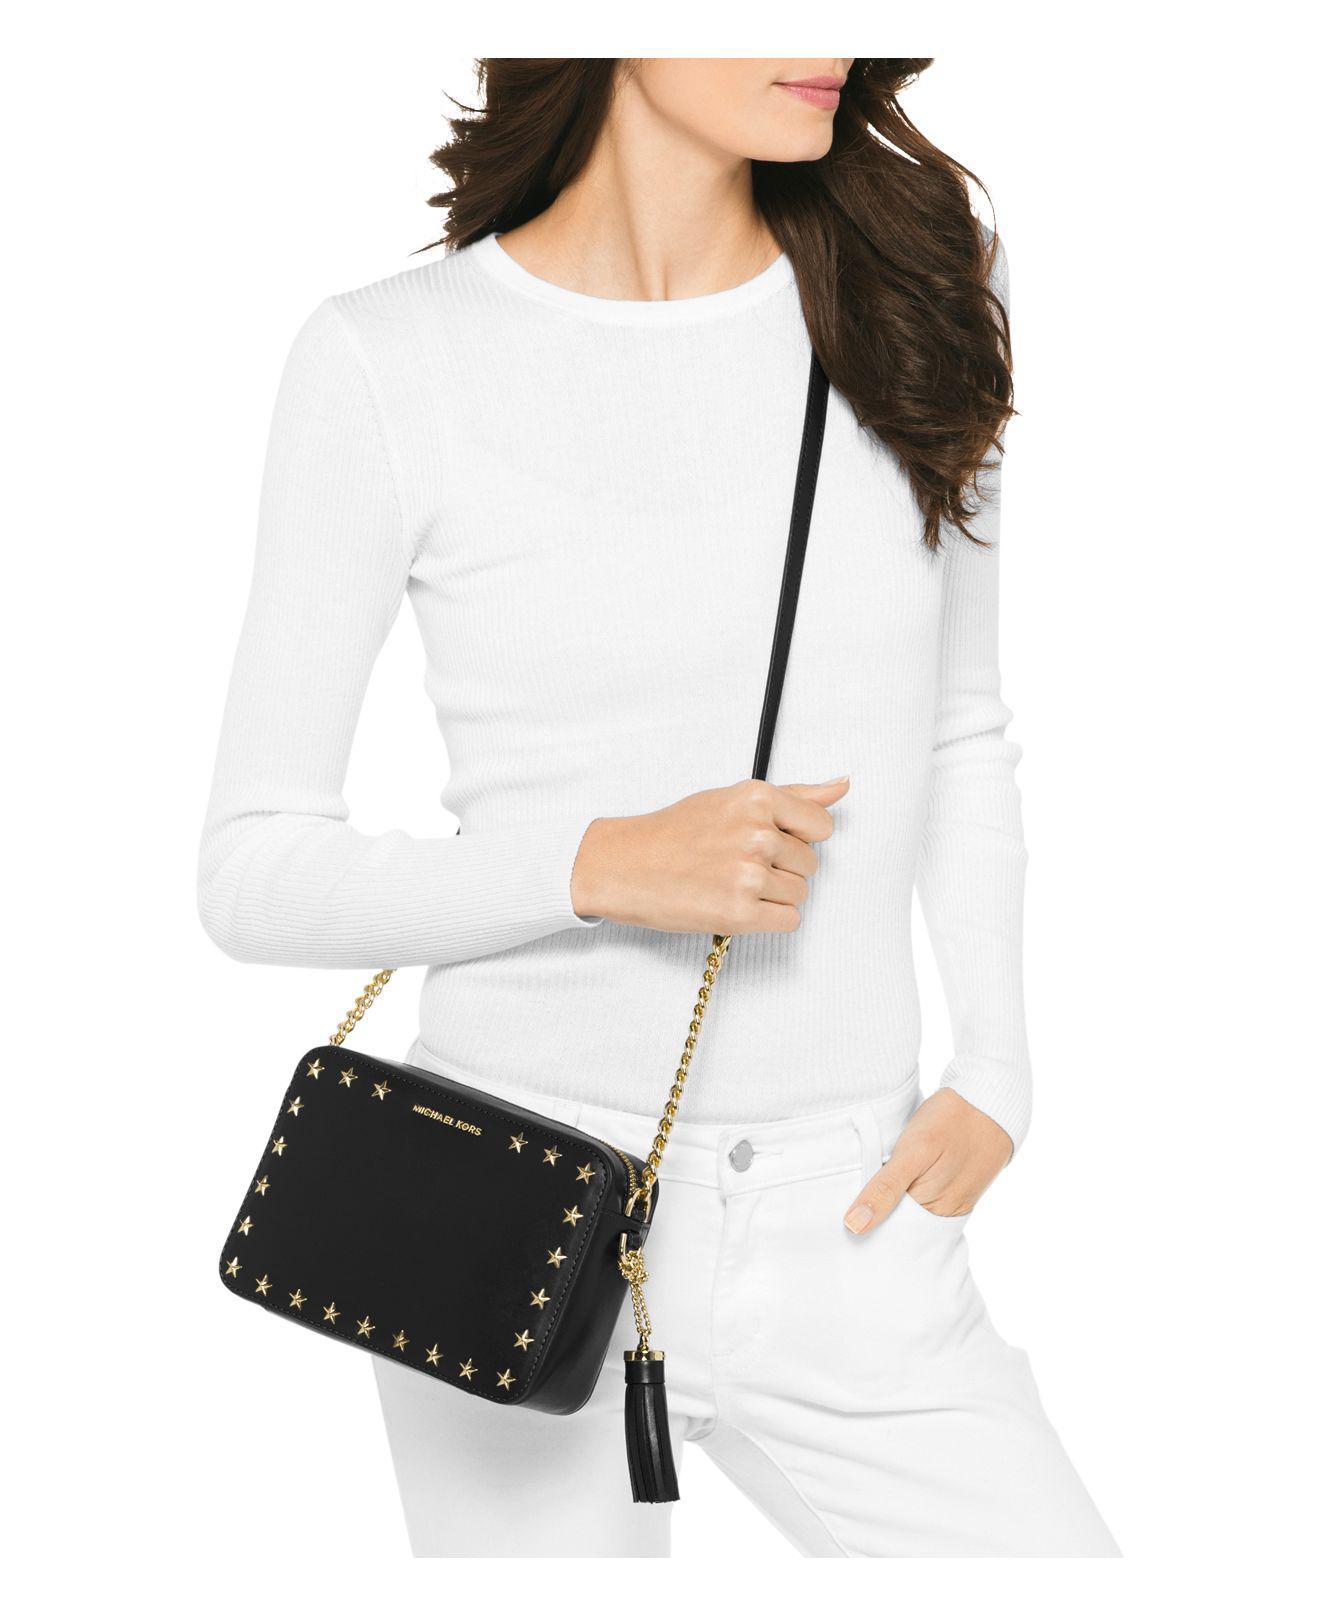 e8d0df39b MICHAEL Michael Kors Ginny Star Stud Medium Leather Camera Bag - Lyst